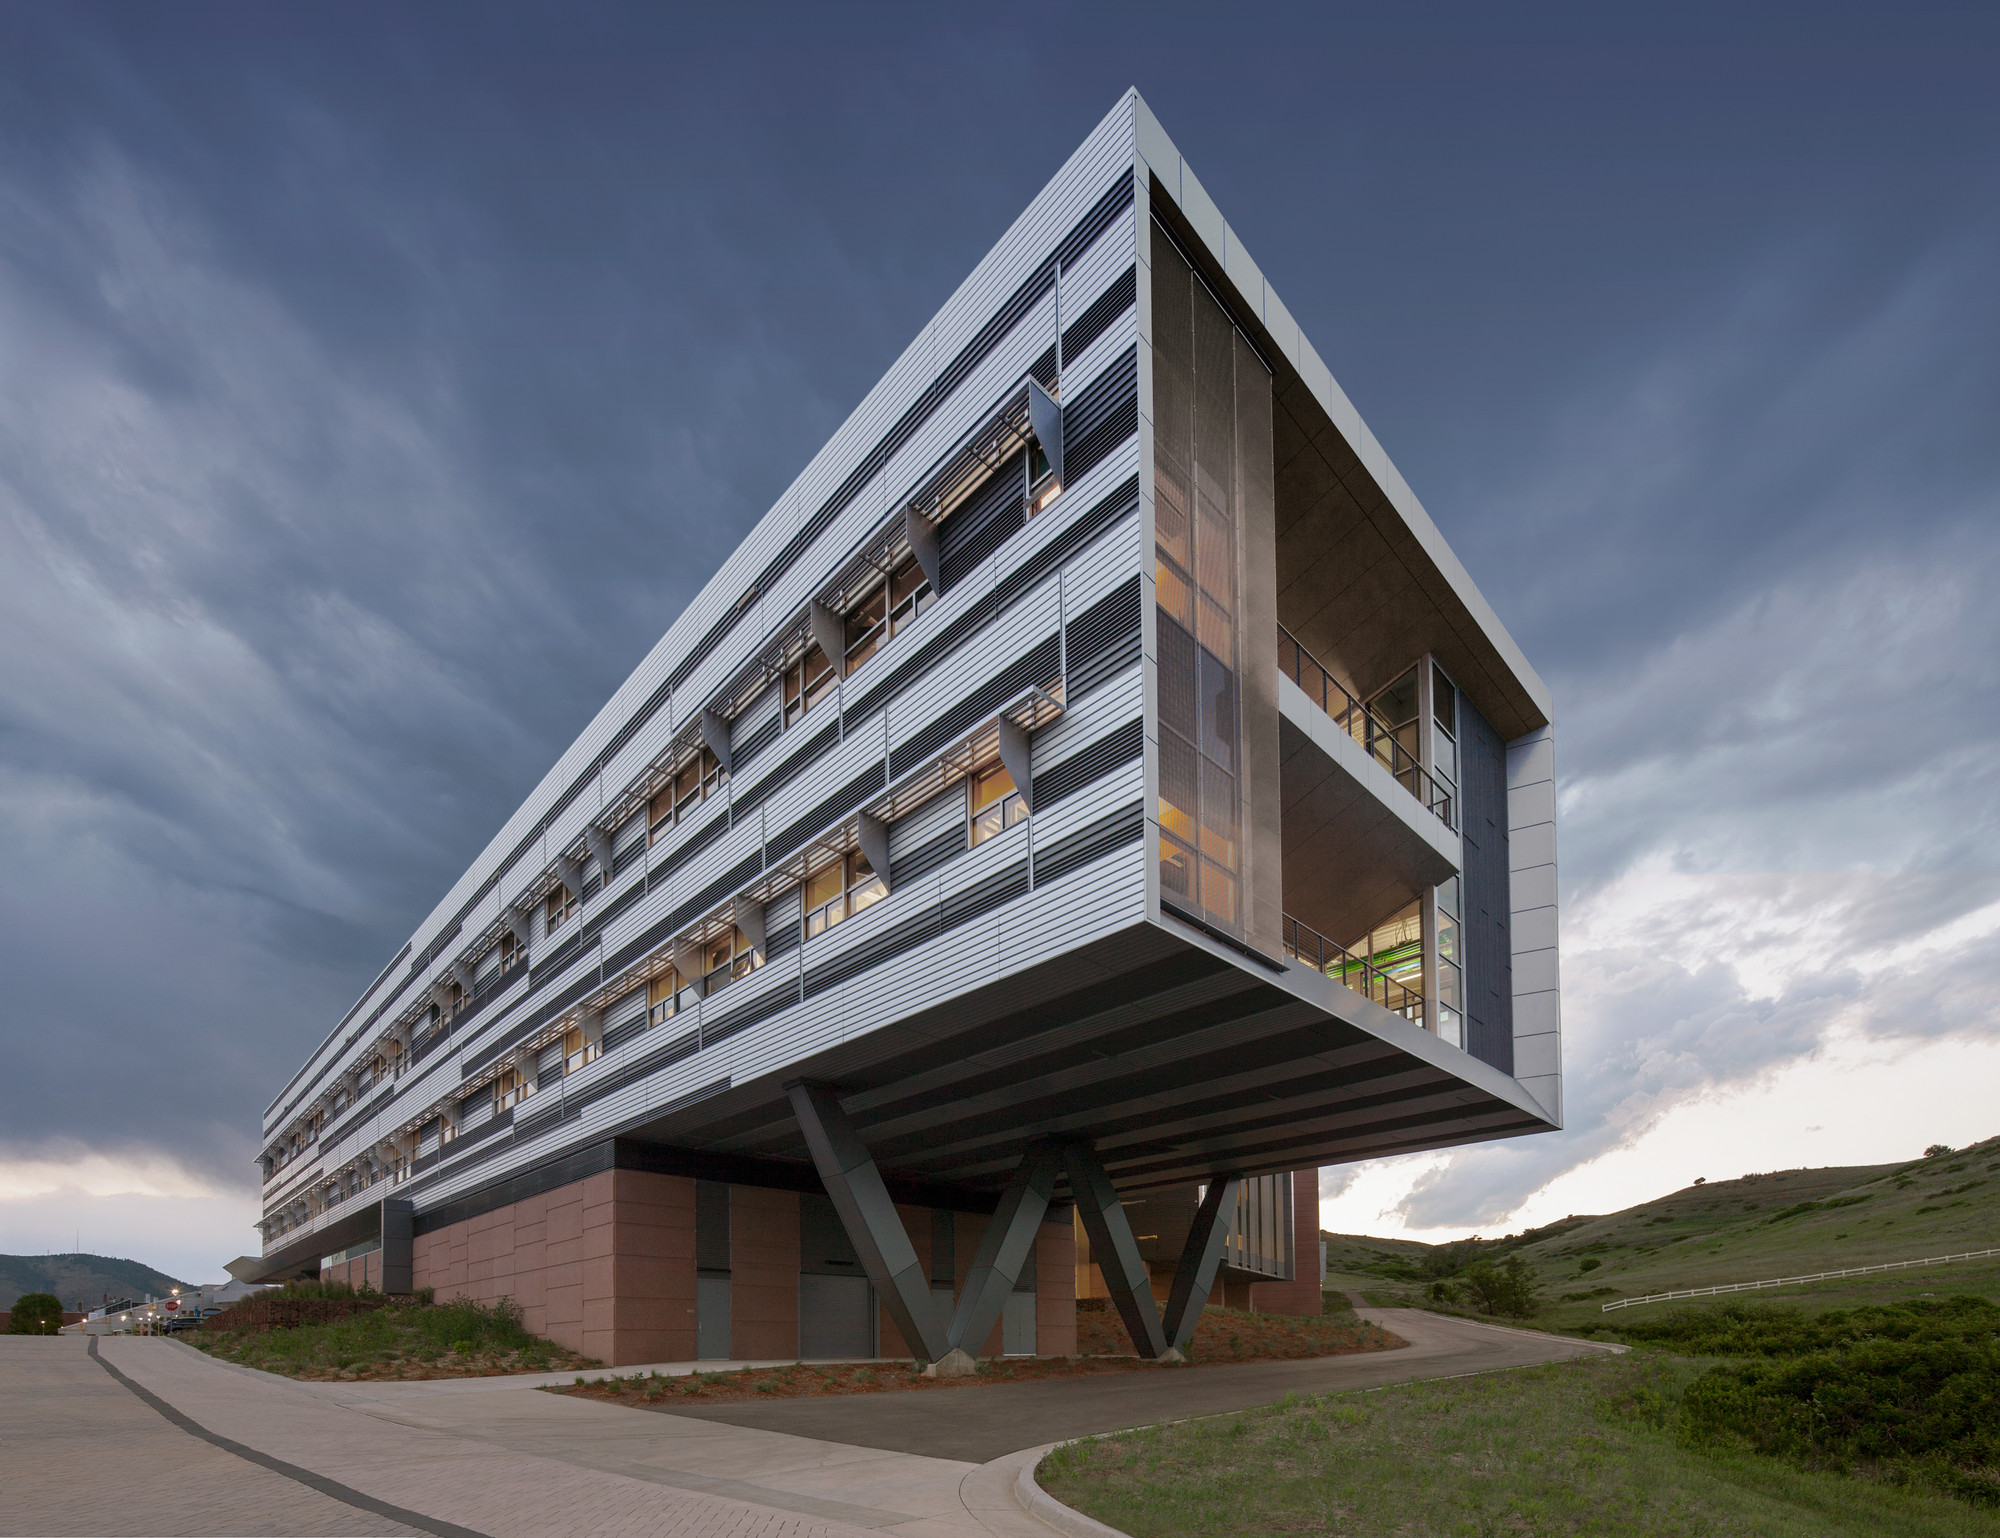 National Renewable Energy Laboratory  / SmithGroupJJR, © Bill Timmerman